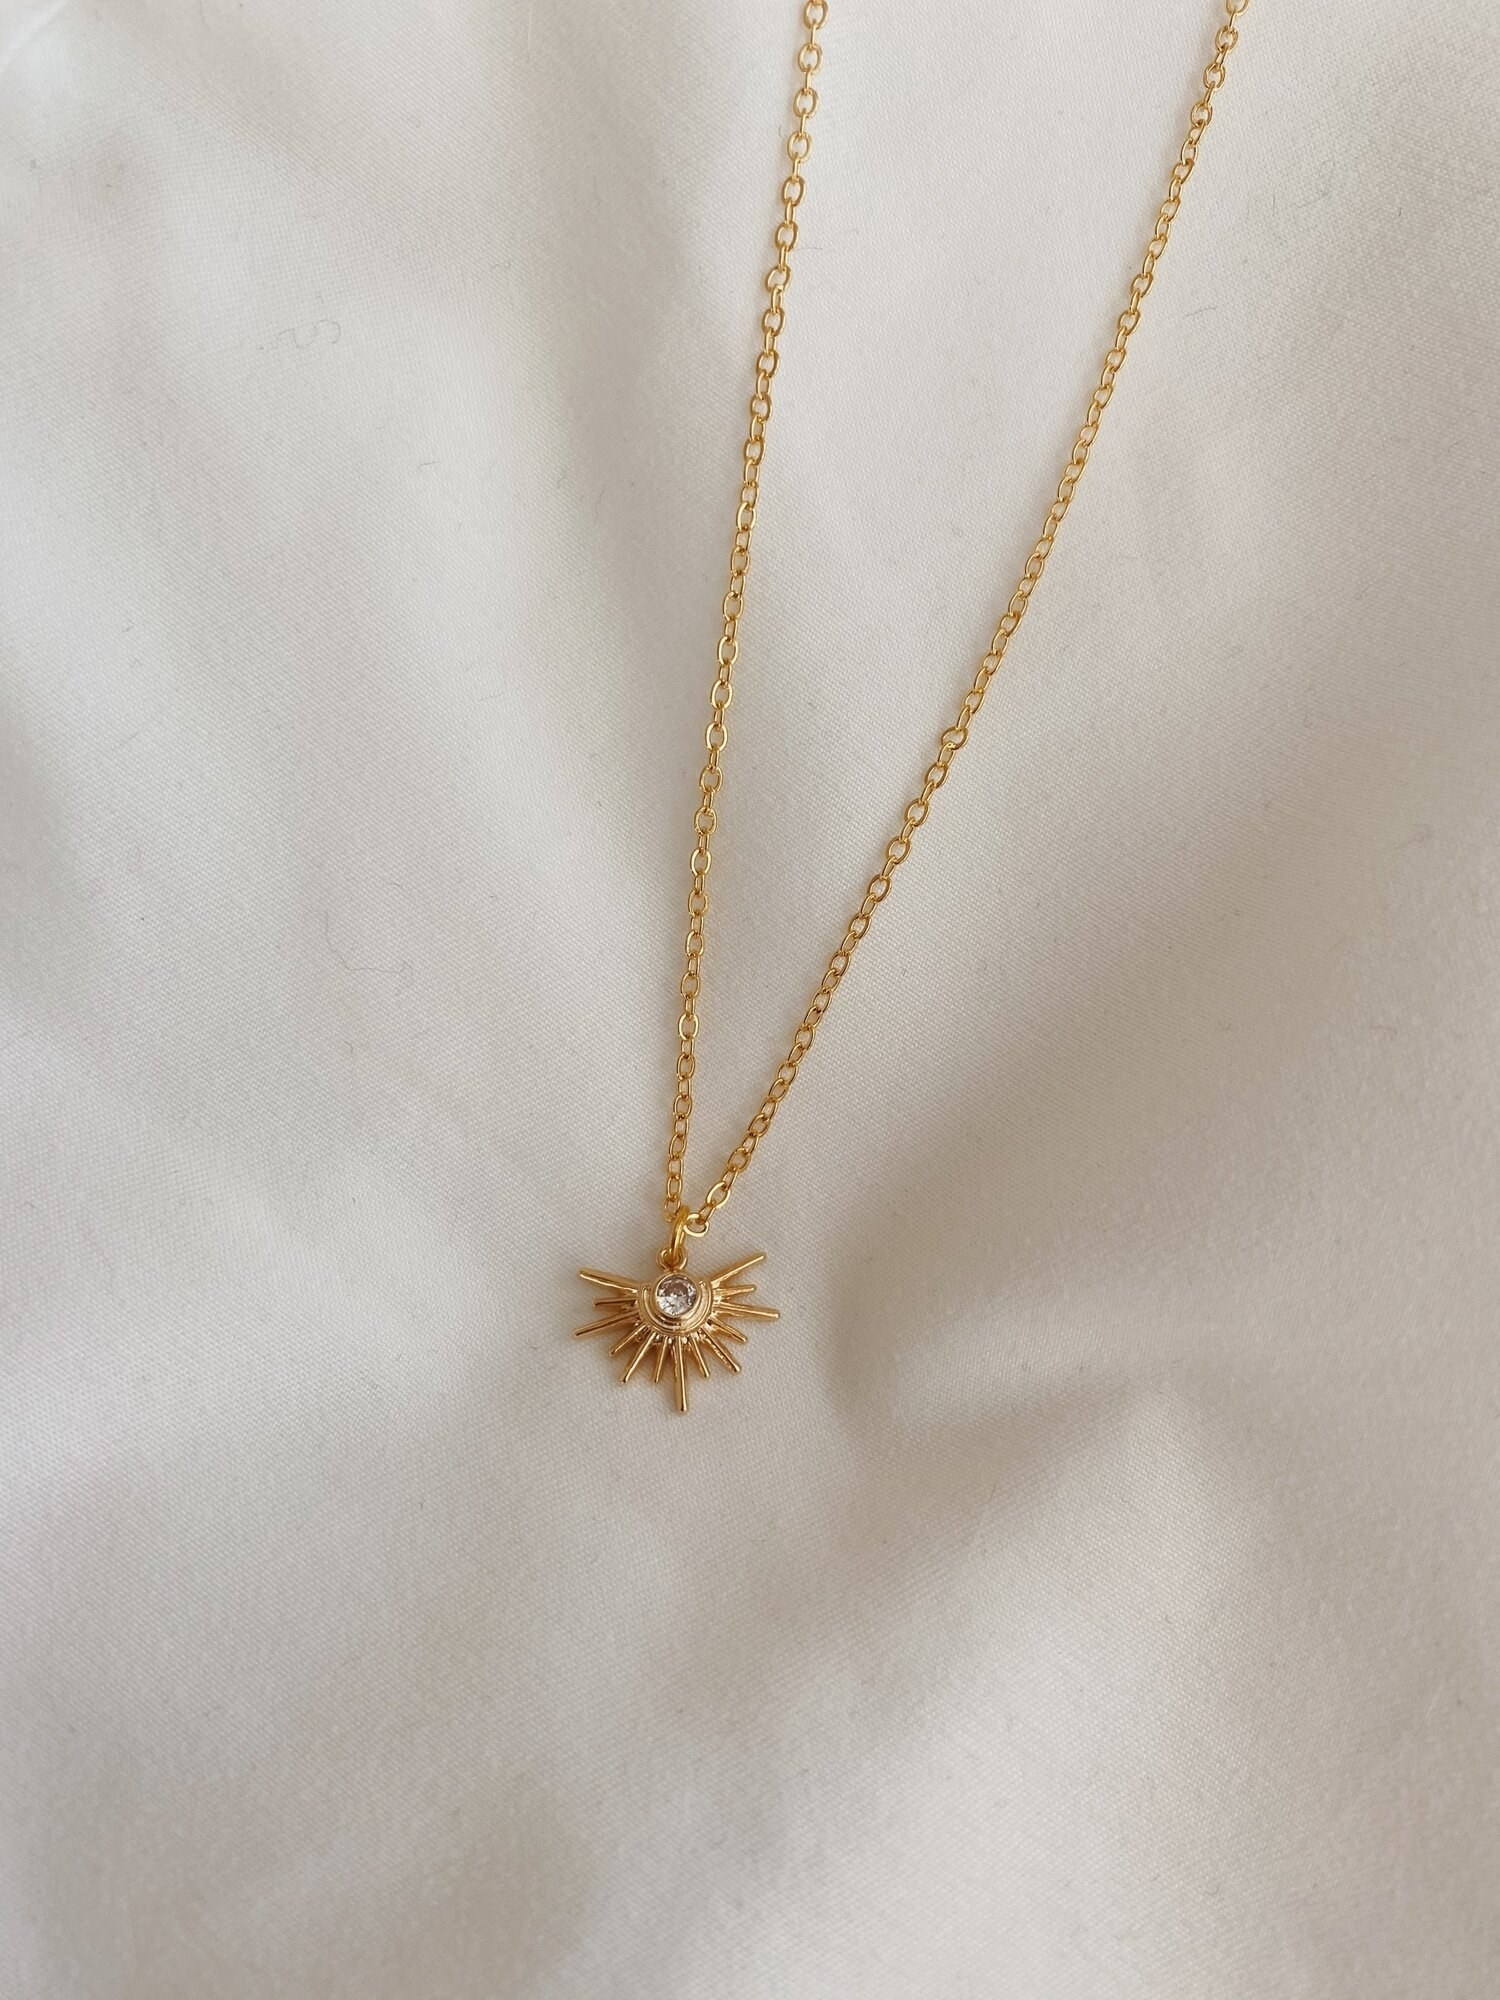 starstruck gold necklace